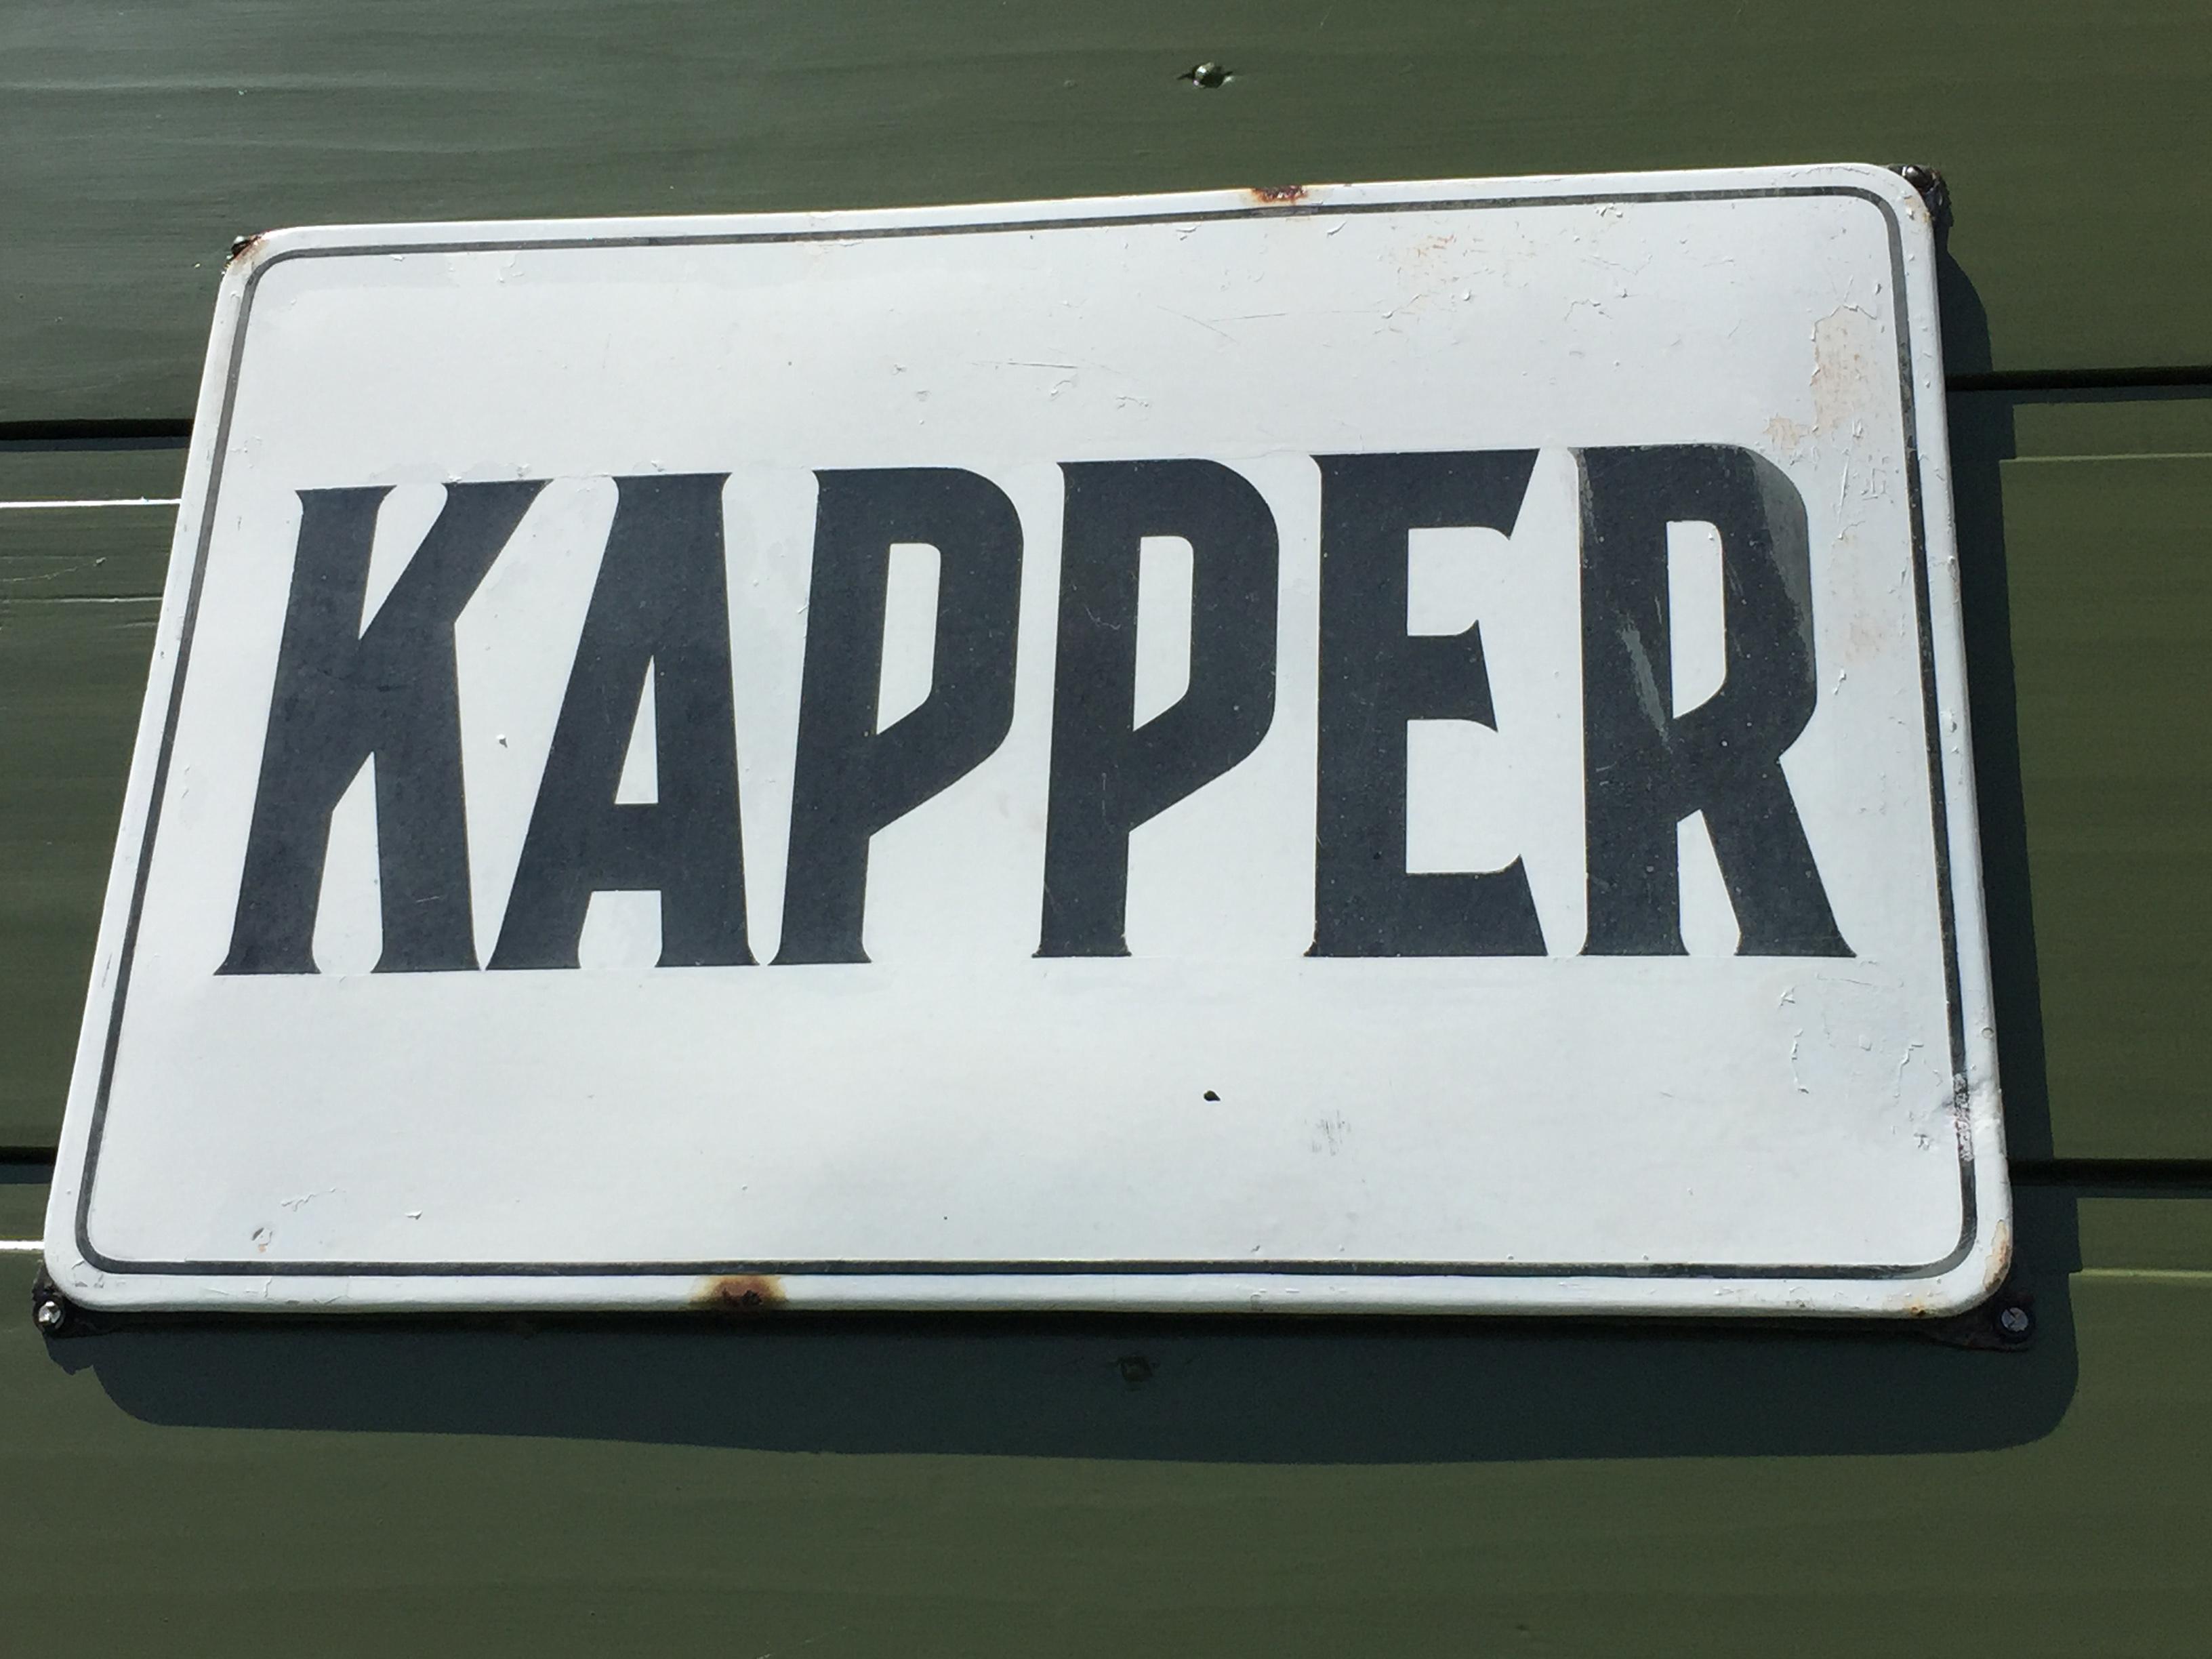 Kapper Hippolytushoef - Kapsalon Het Kappershuis